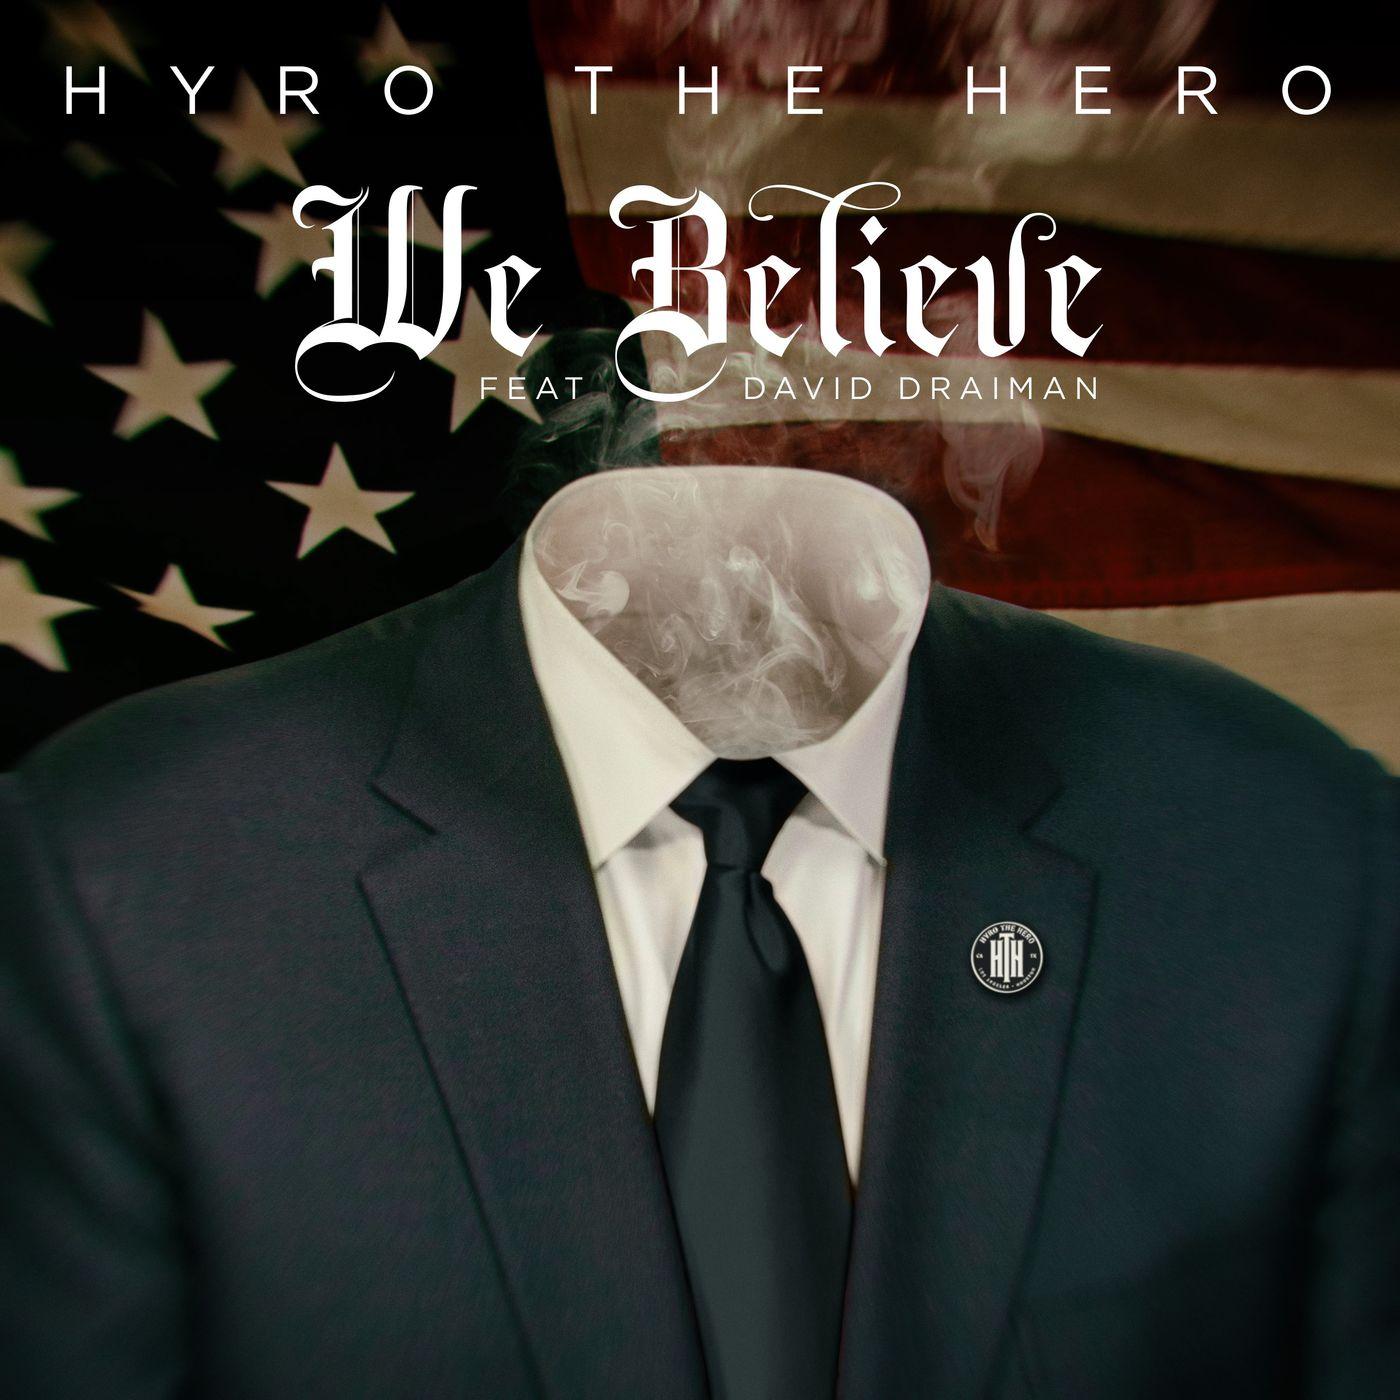 Hyro The Hero - We Believe [single] (2020)